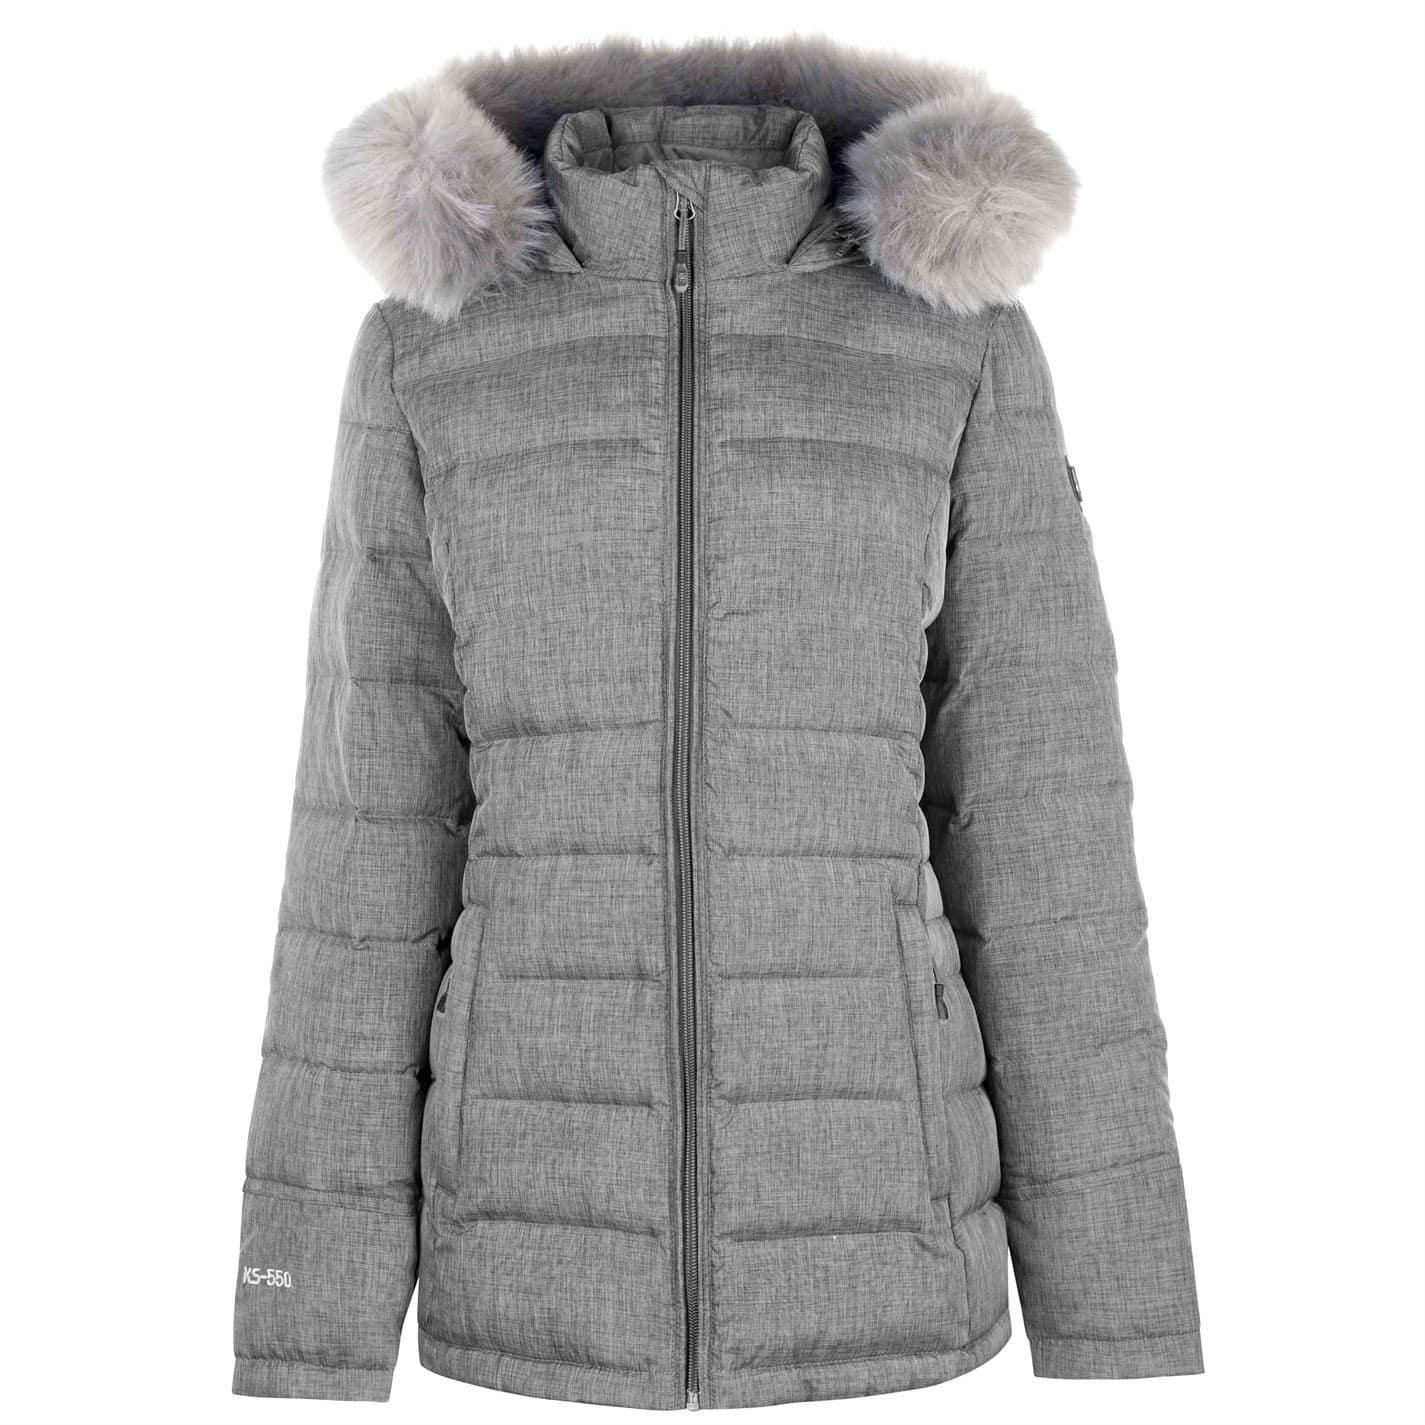 Karrimor Womens Radiant Fleece Jacket Coat Top Long Sleeve Lightweight Hooded